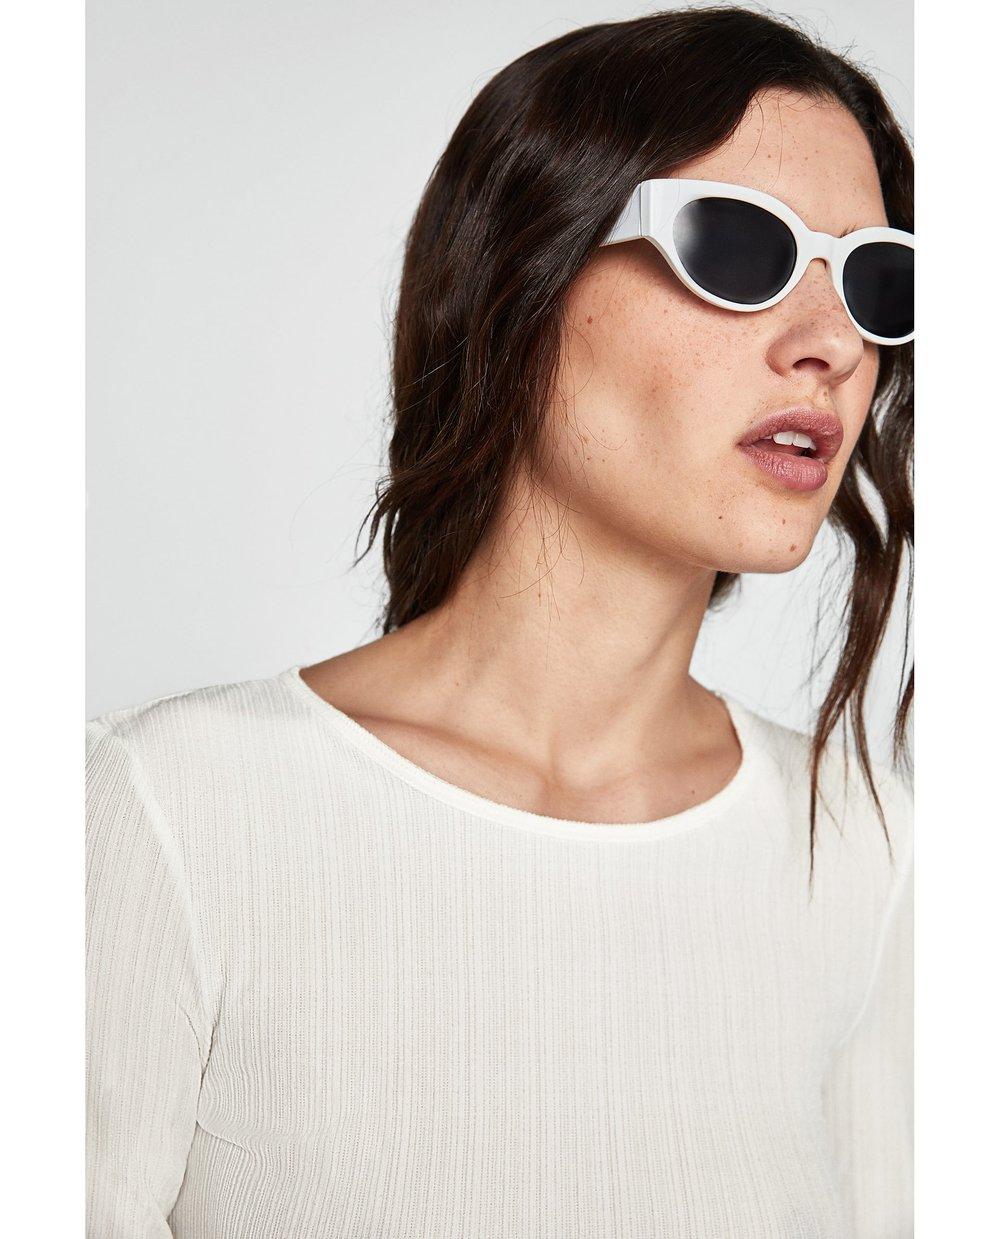 - TEXTURED WEAVE T-SHIRT / Zara $20